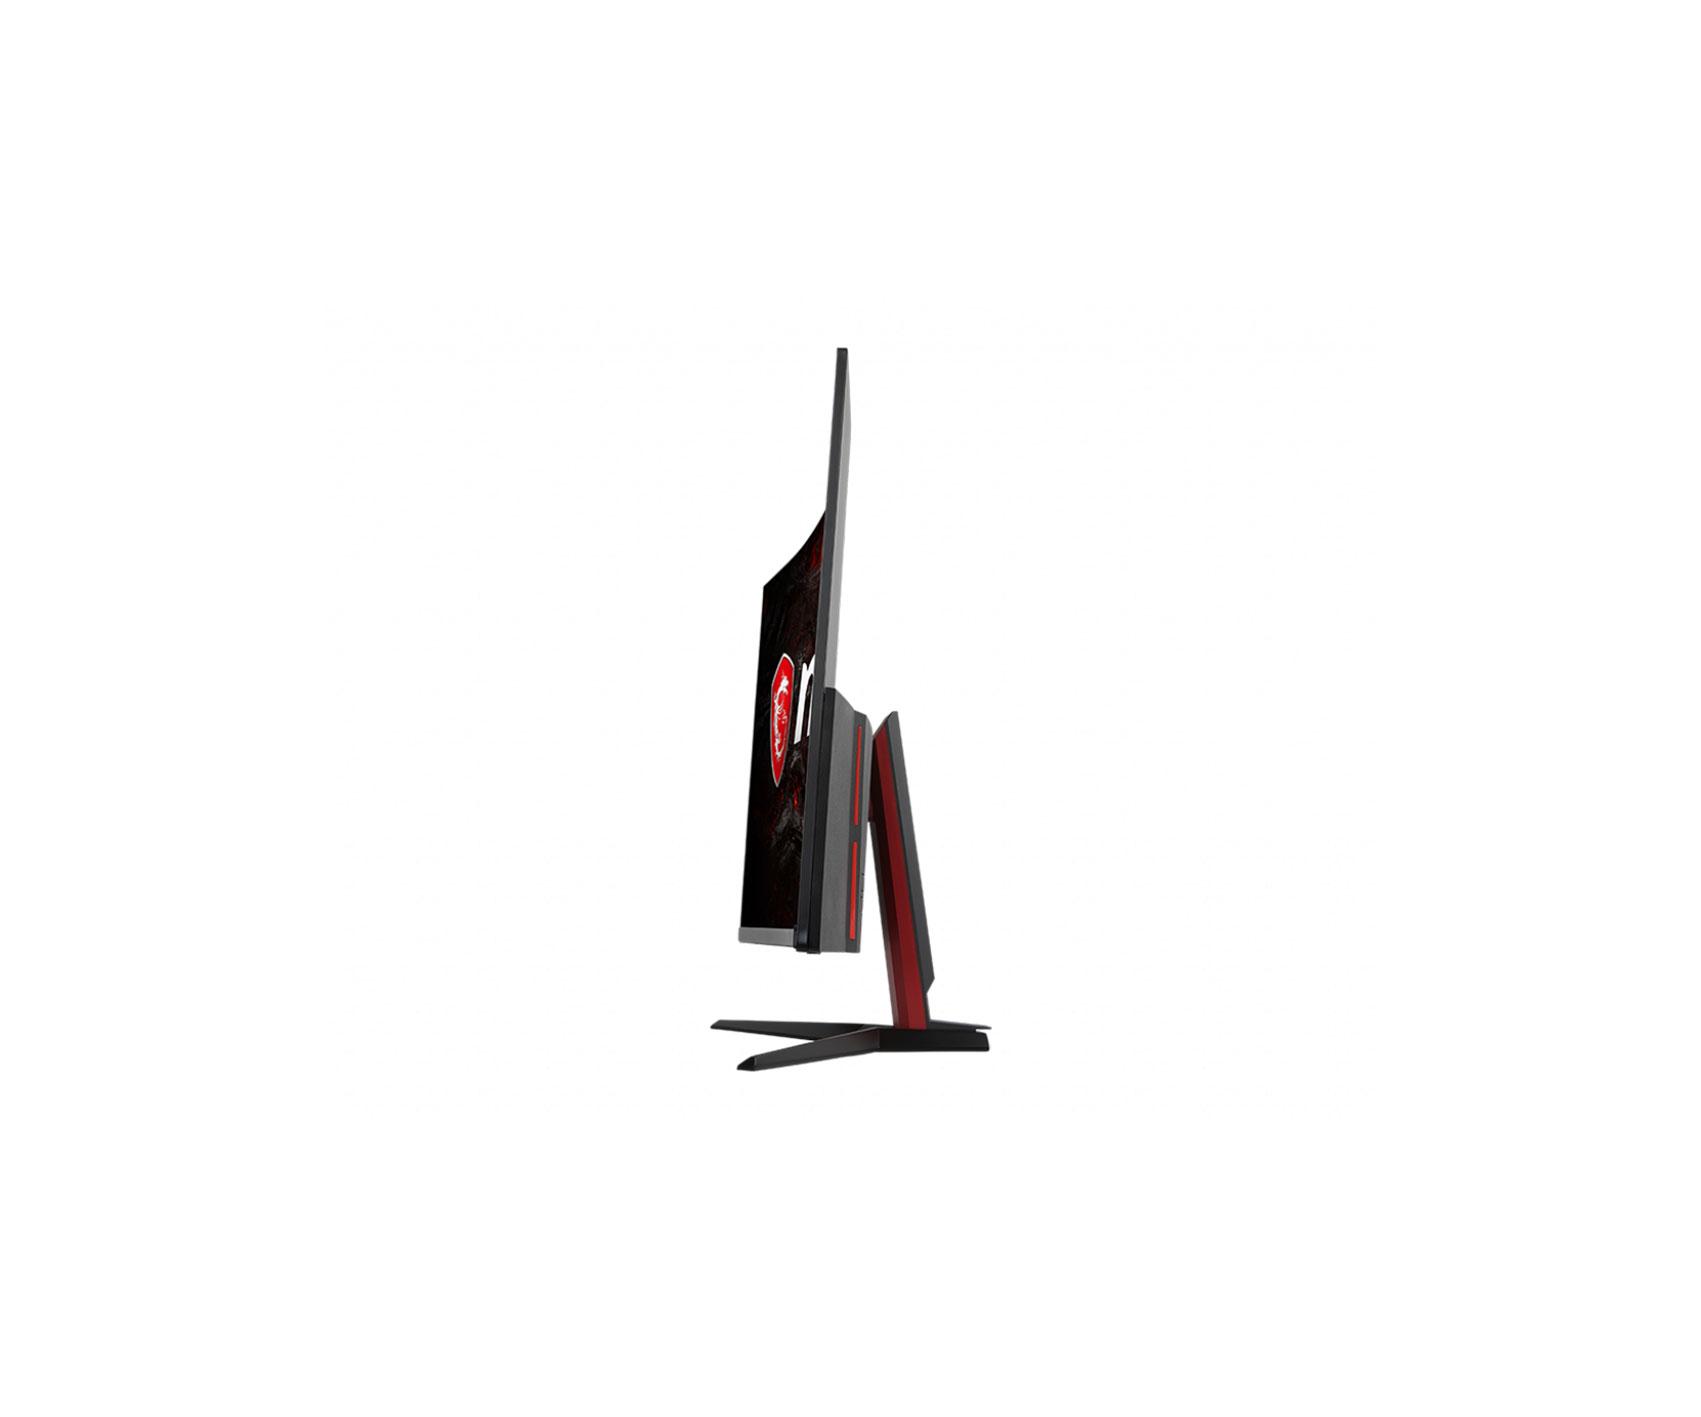 MSI 32 inch Optix AG32CV 1080p 165hz 1ms 110% sRGB Curved Monitor